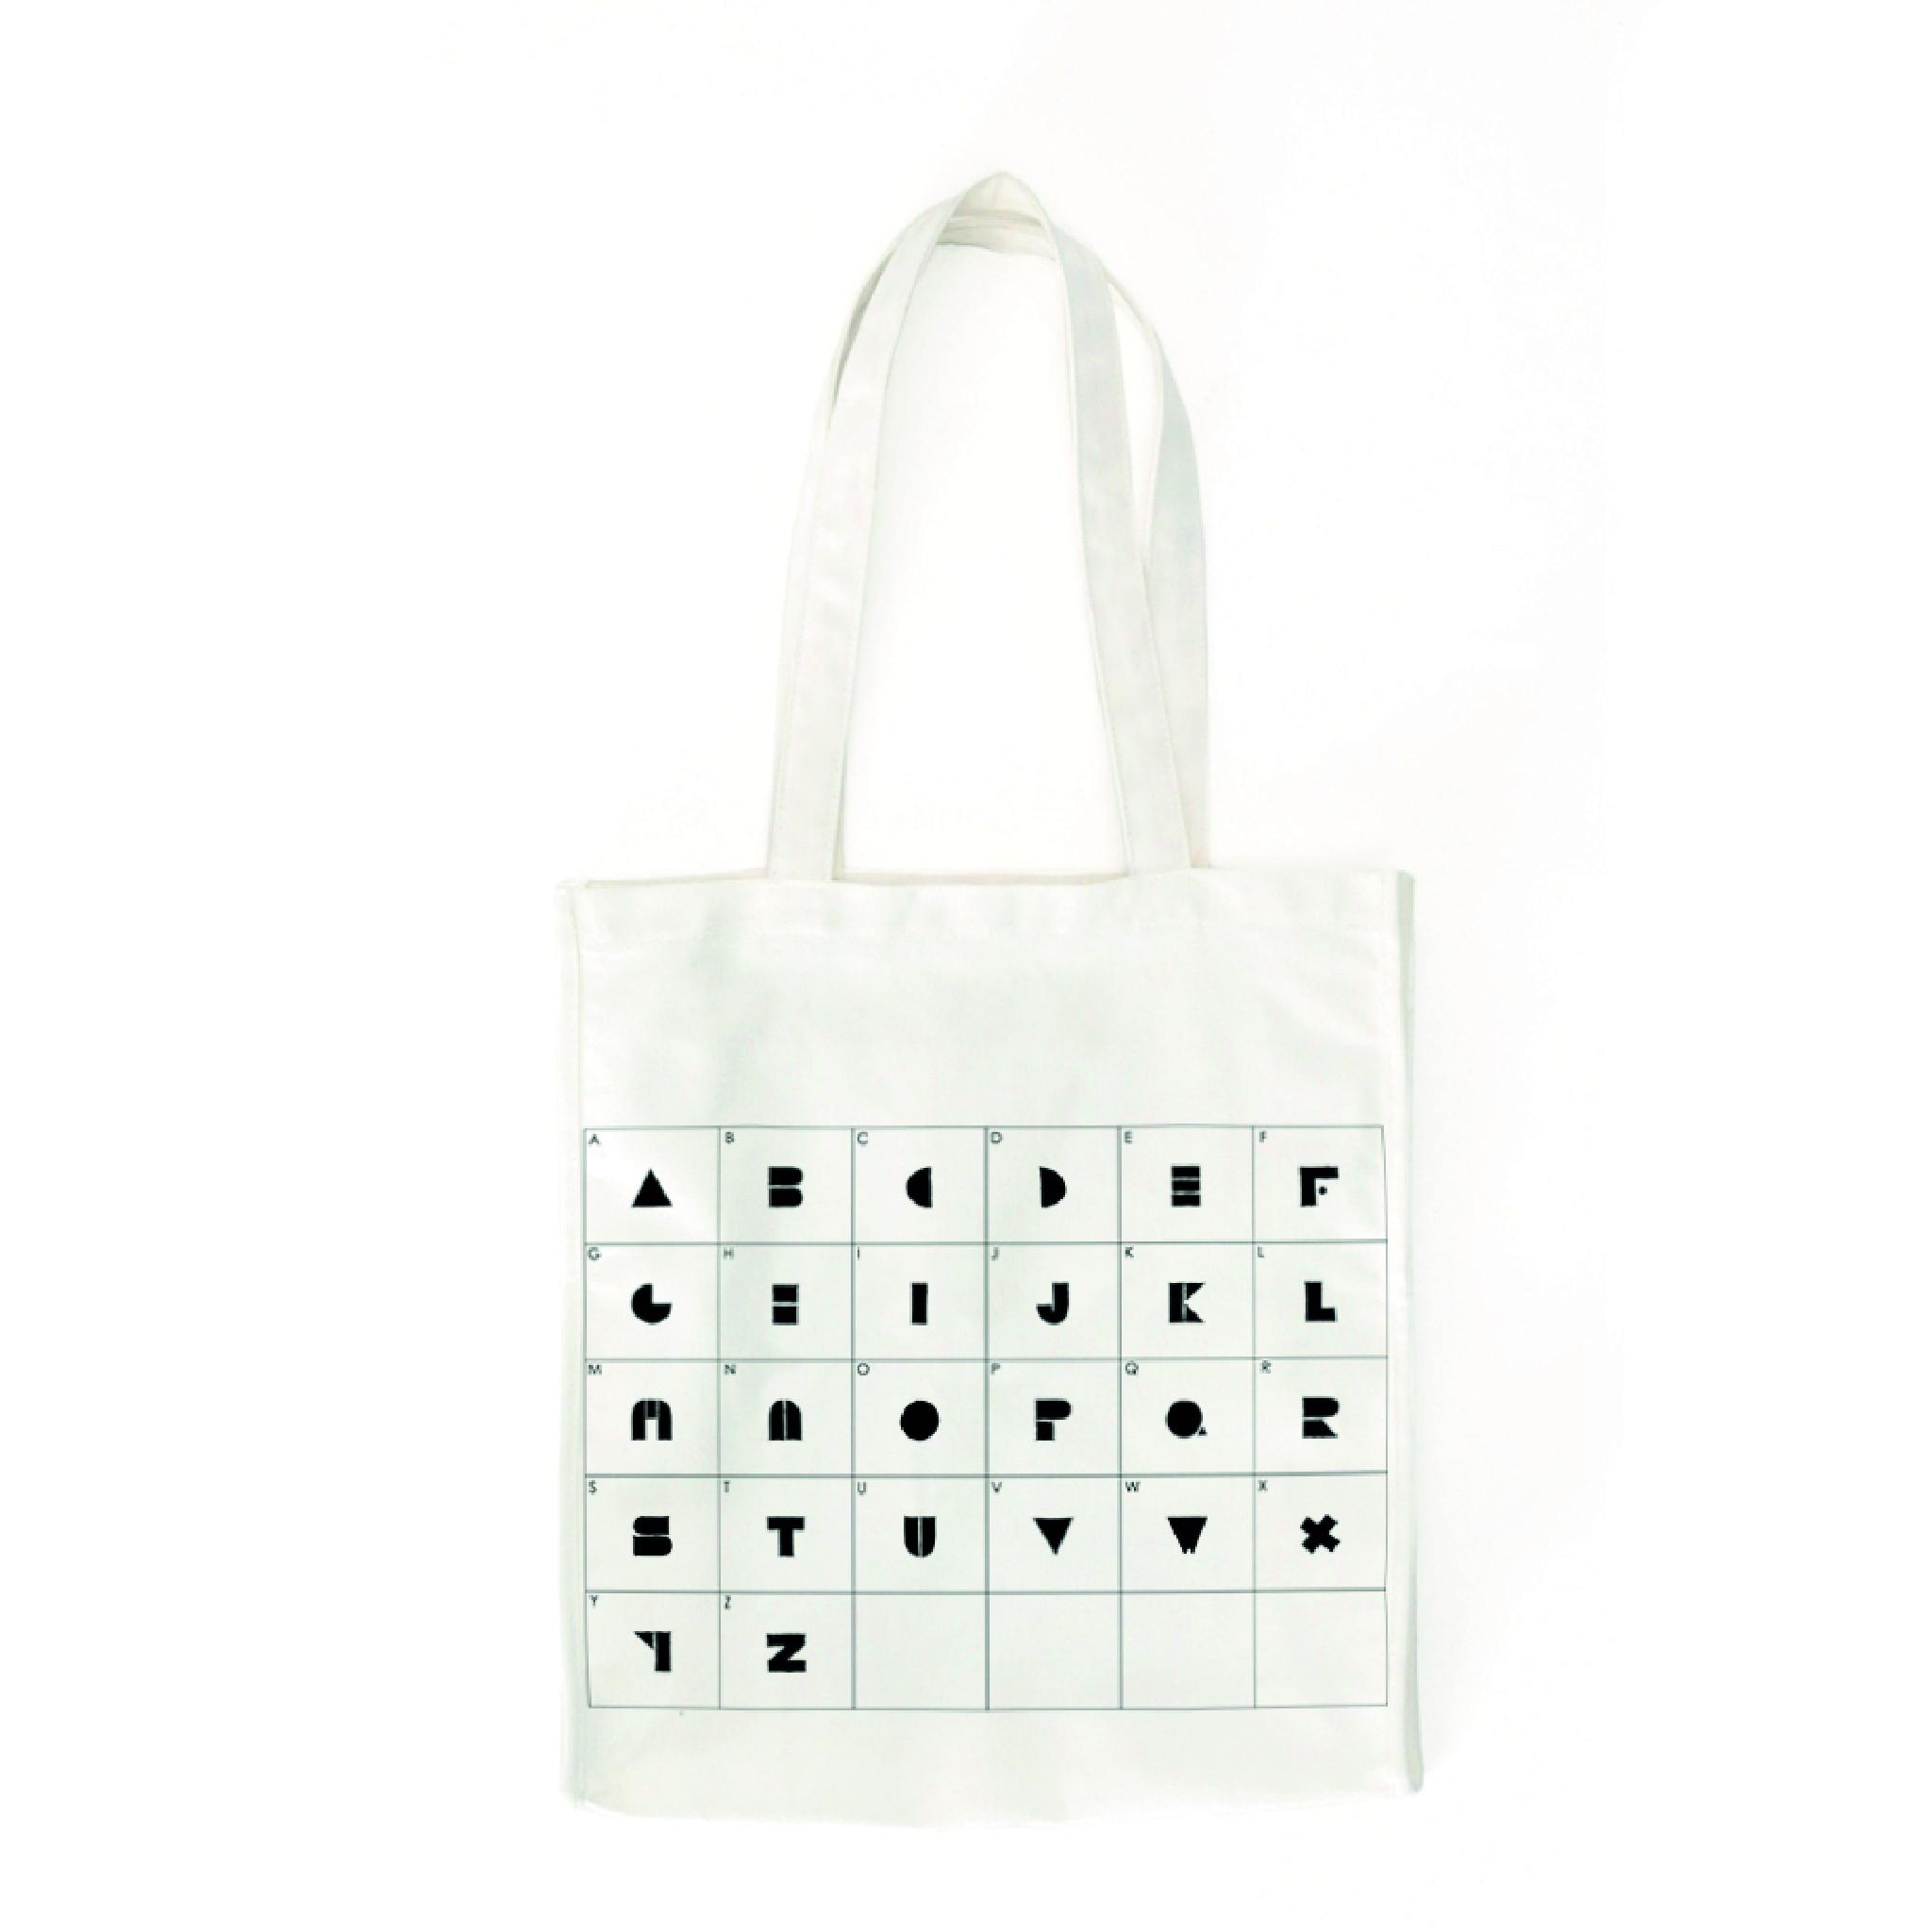 Tote Bag-01-03.jpg